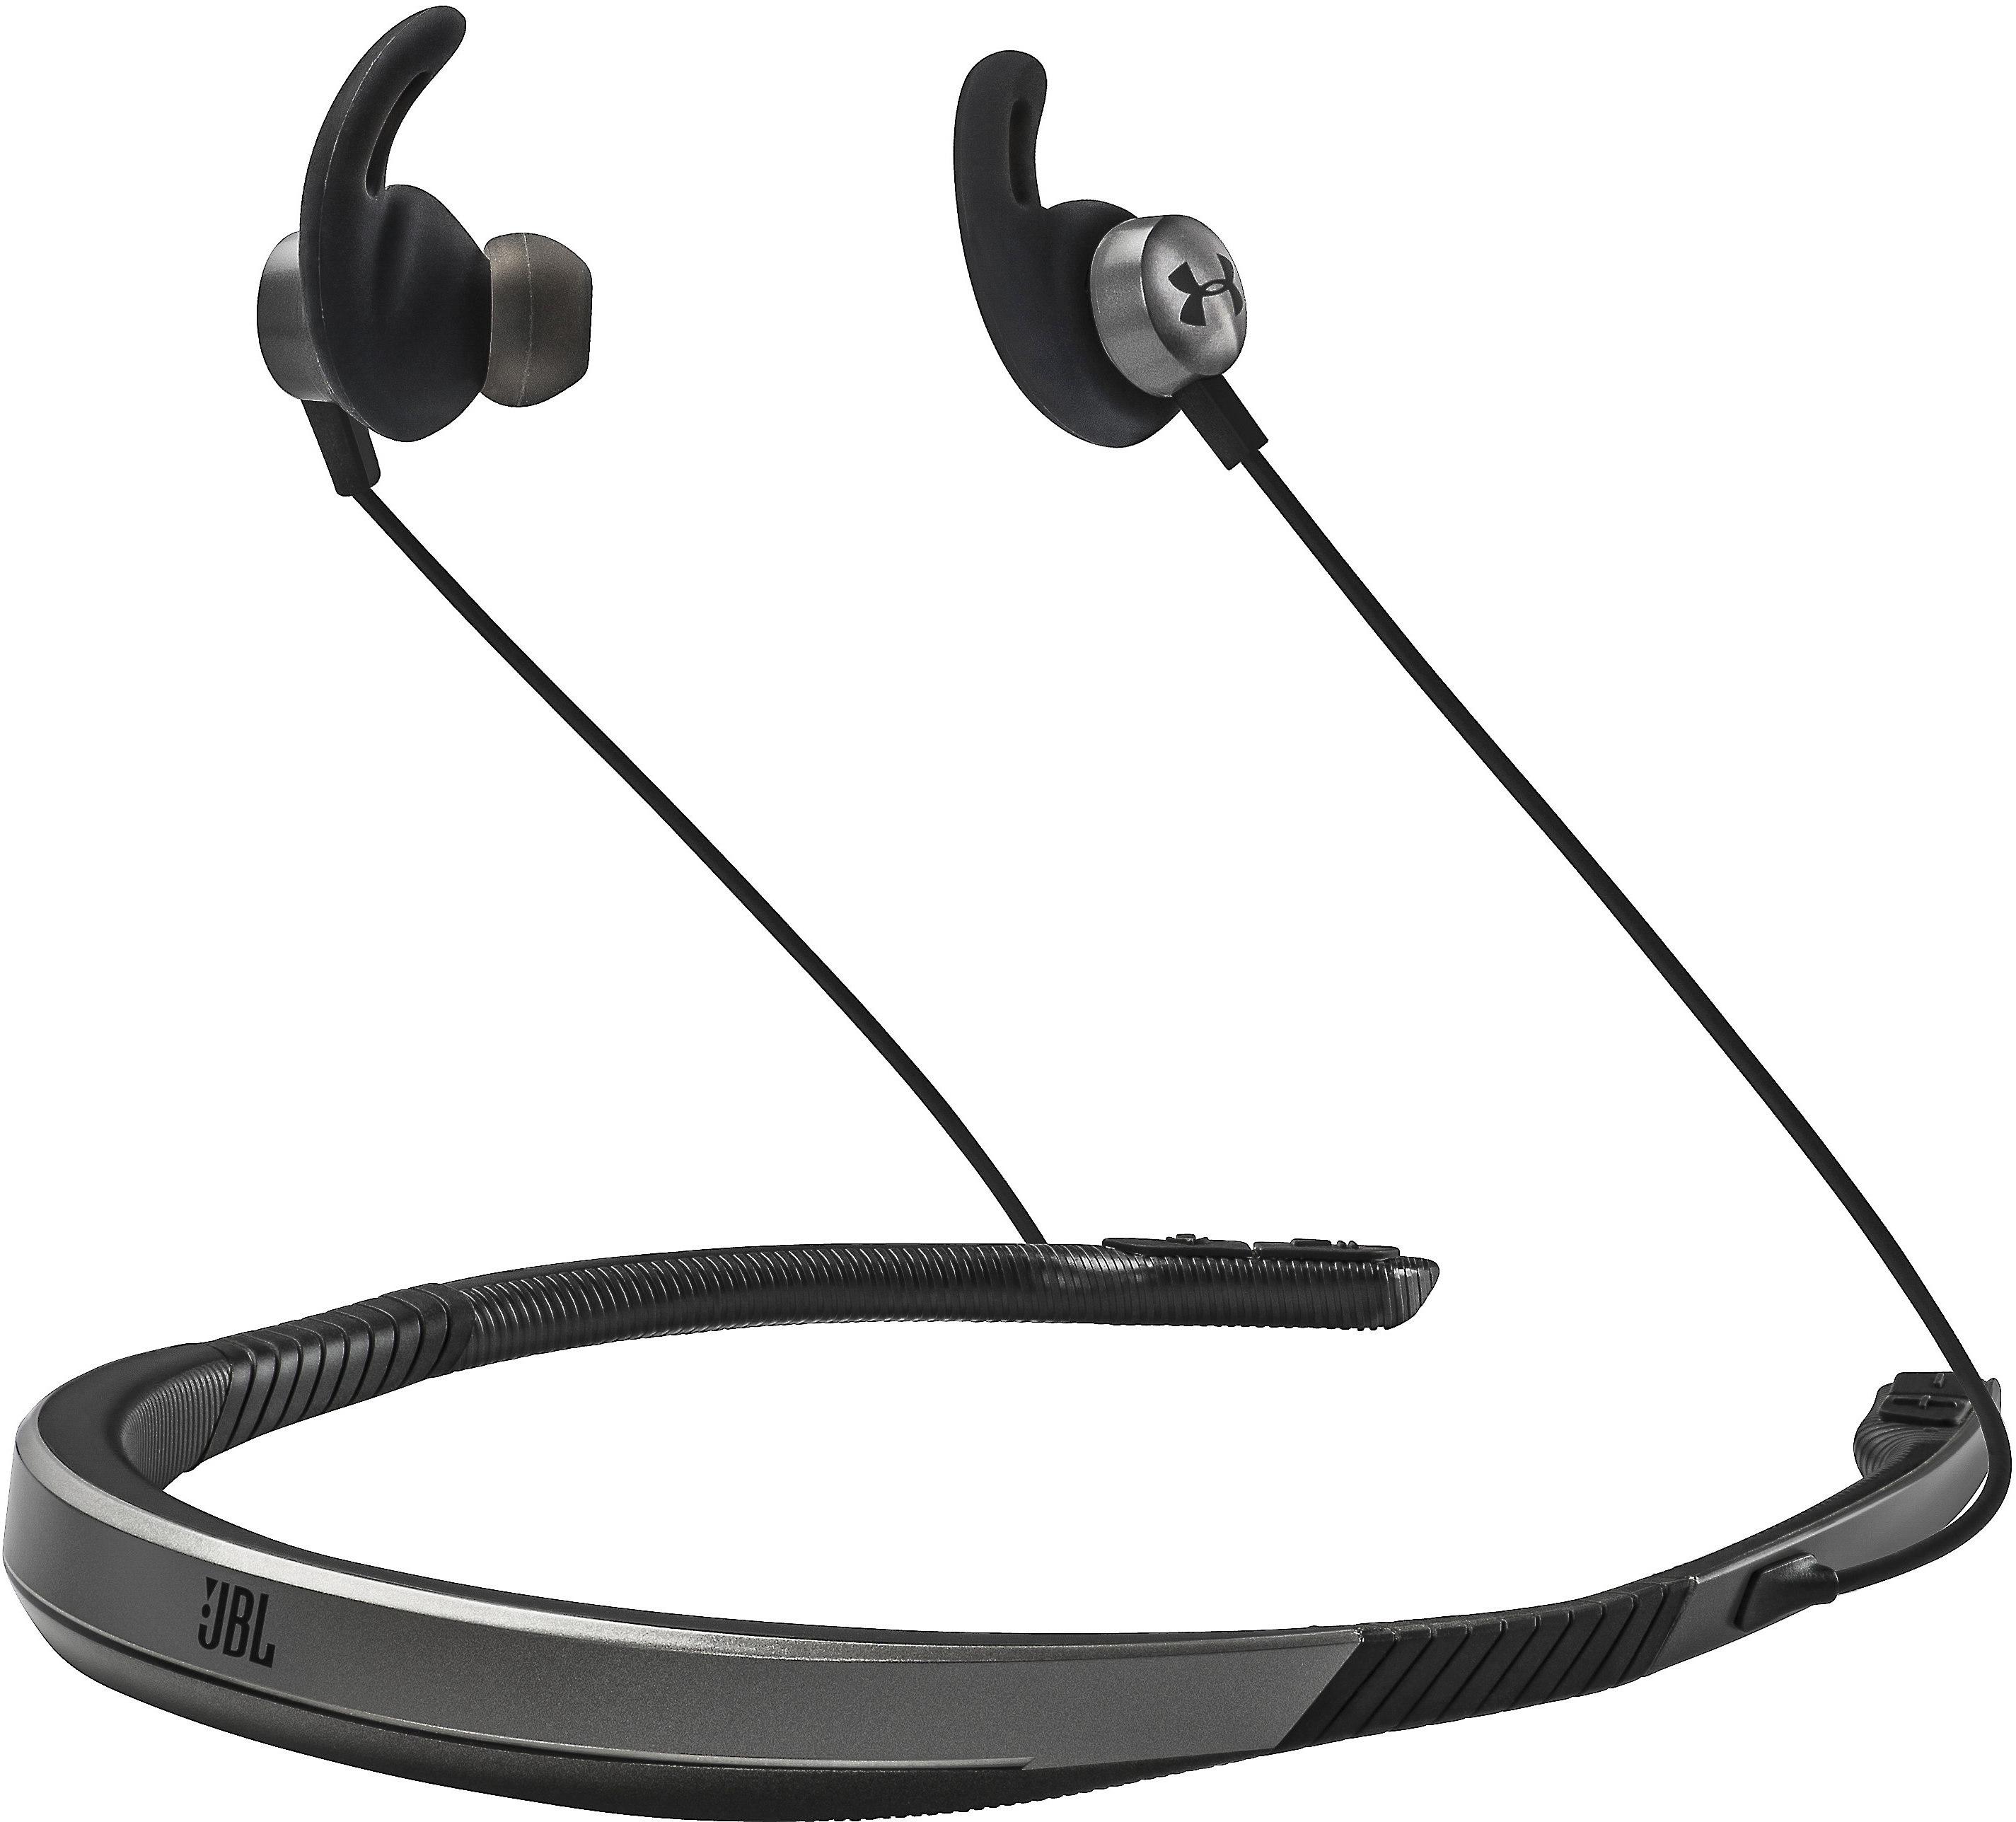 Under Armour Sport Wireless Flex Engineered By Jbl Bluetooth Neckband Sports Headphones At Crutchfield